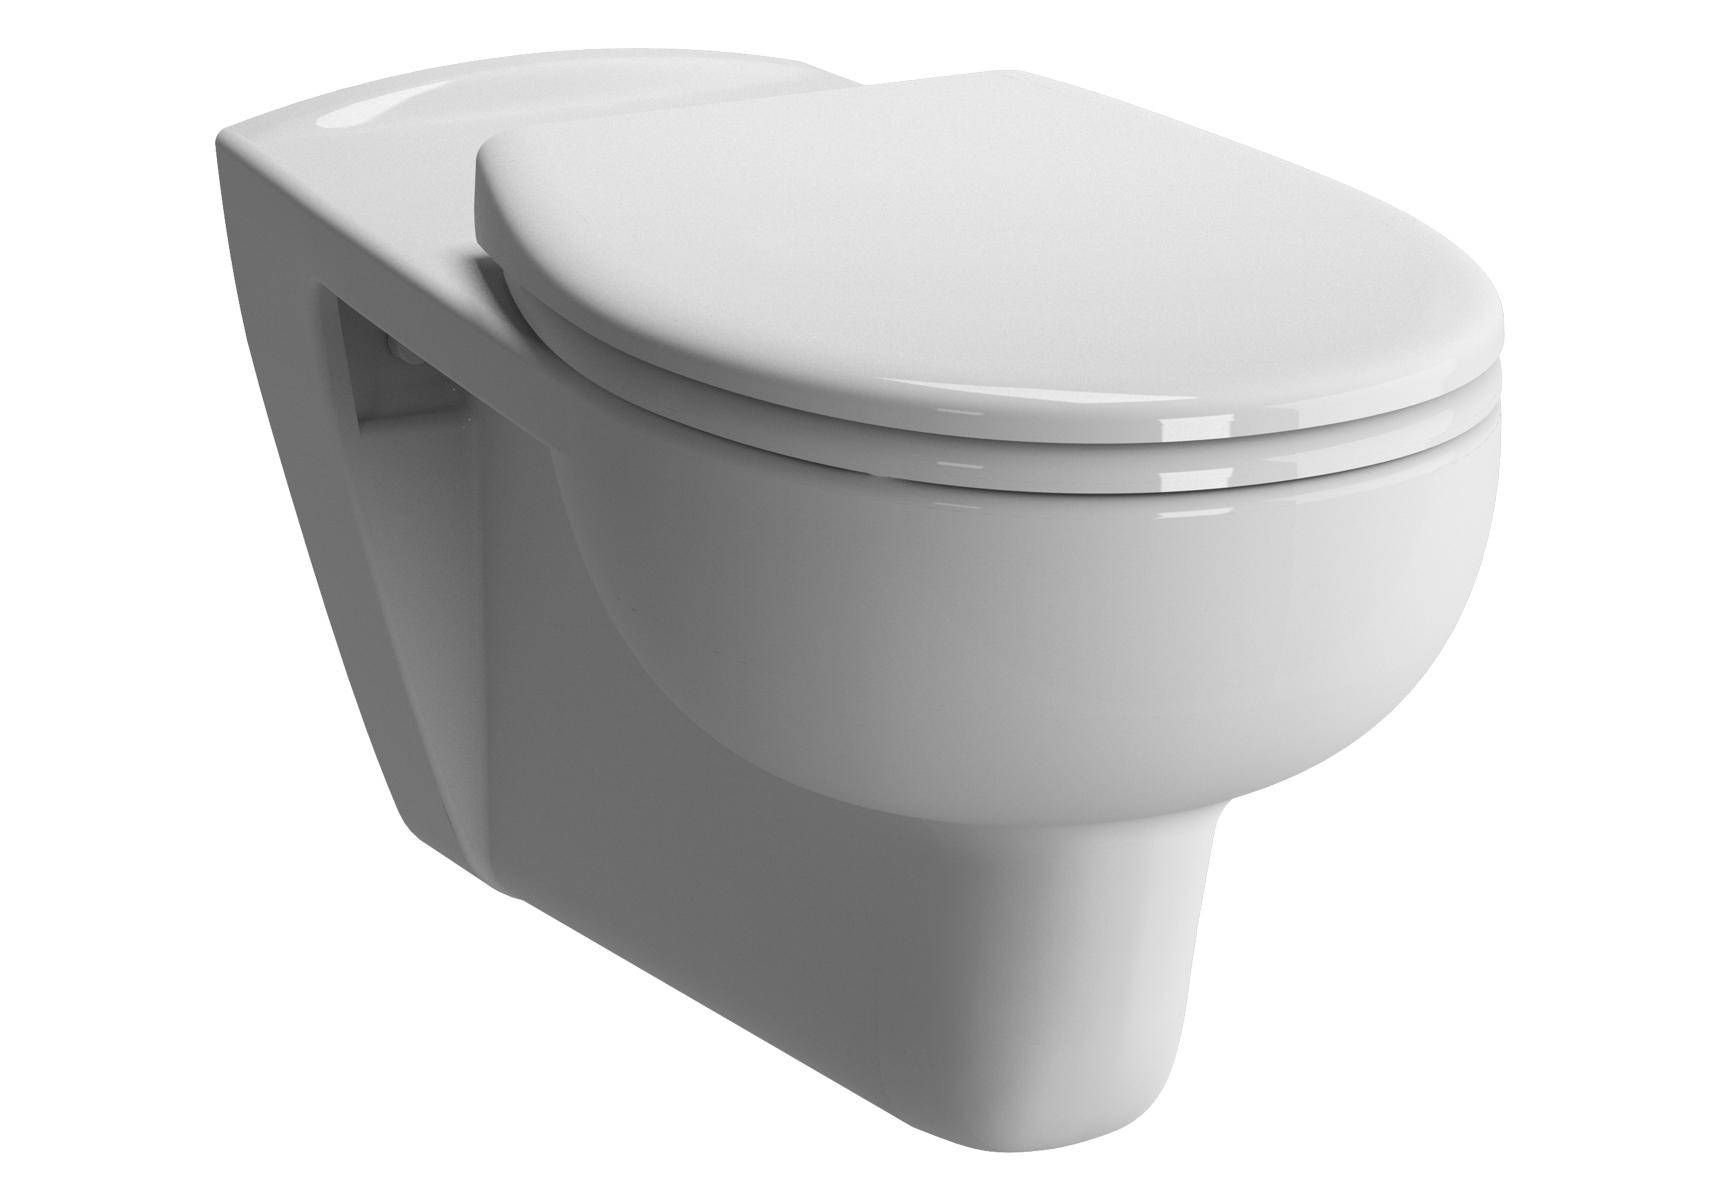 Conforma Wand-WC VitrA Flush mit Bidetfunktion, Weiß mit VitrA Clean